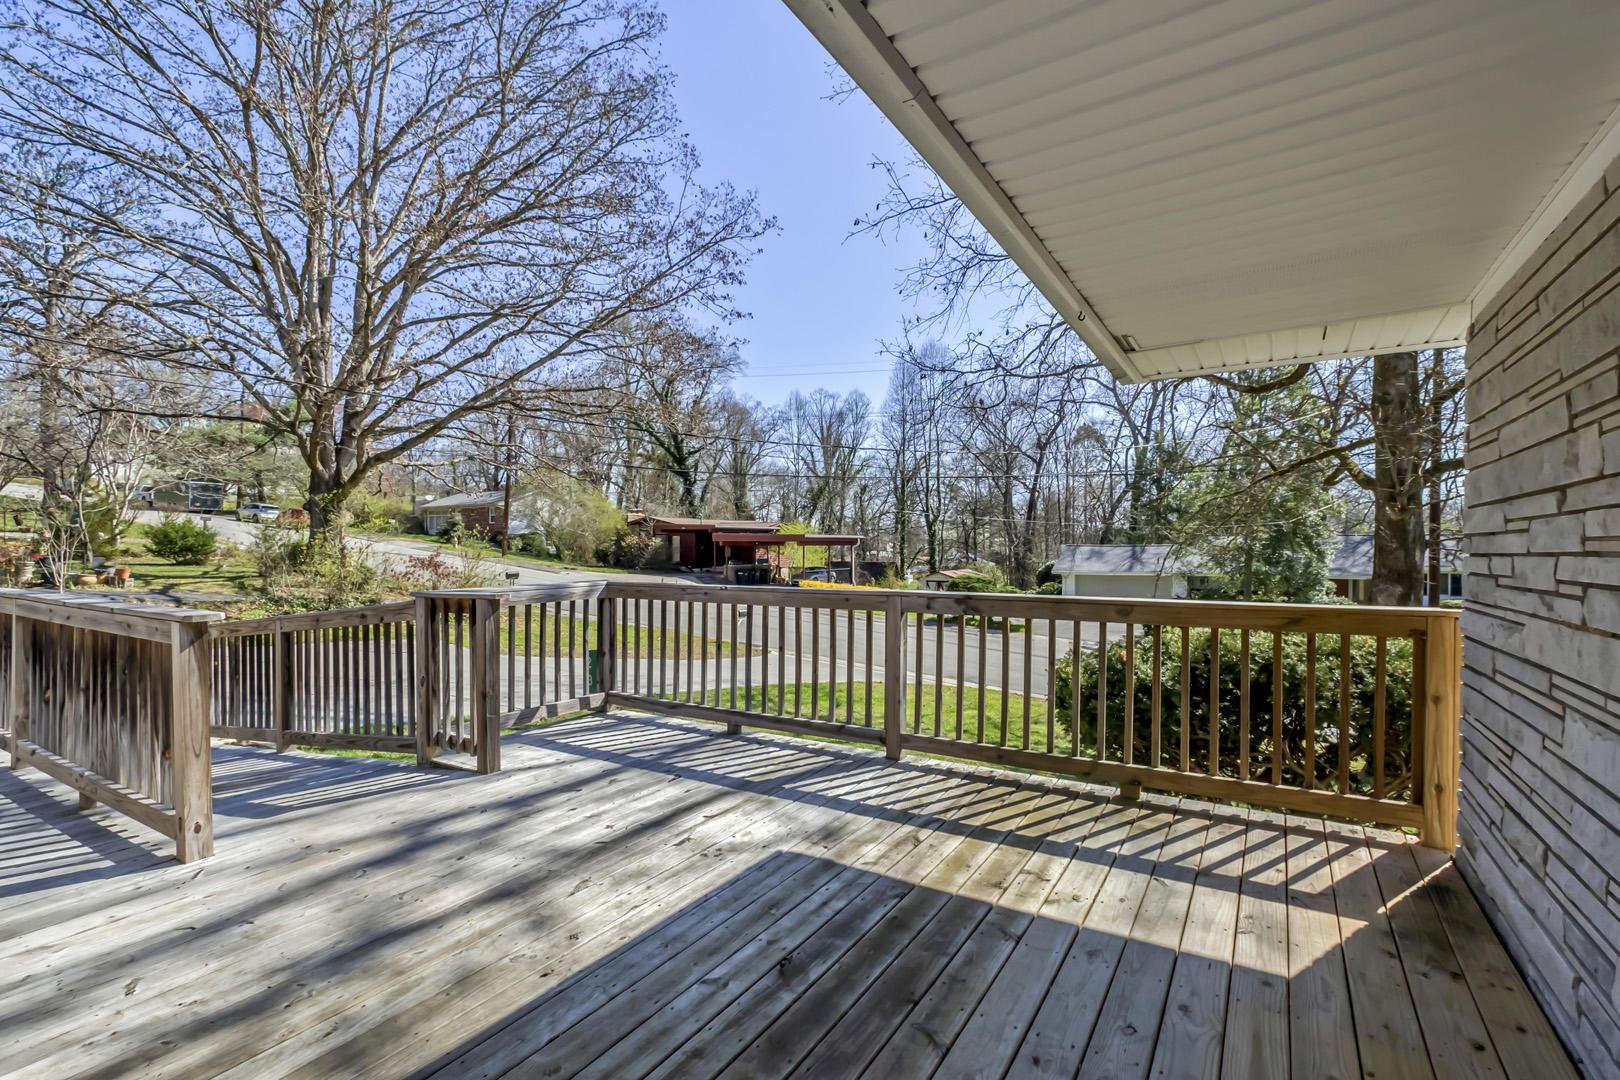 Photo of 233 Iroquois Rd, Oak Ridge, TN 37830 (MLS # 1146806)